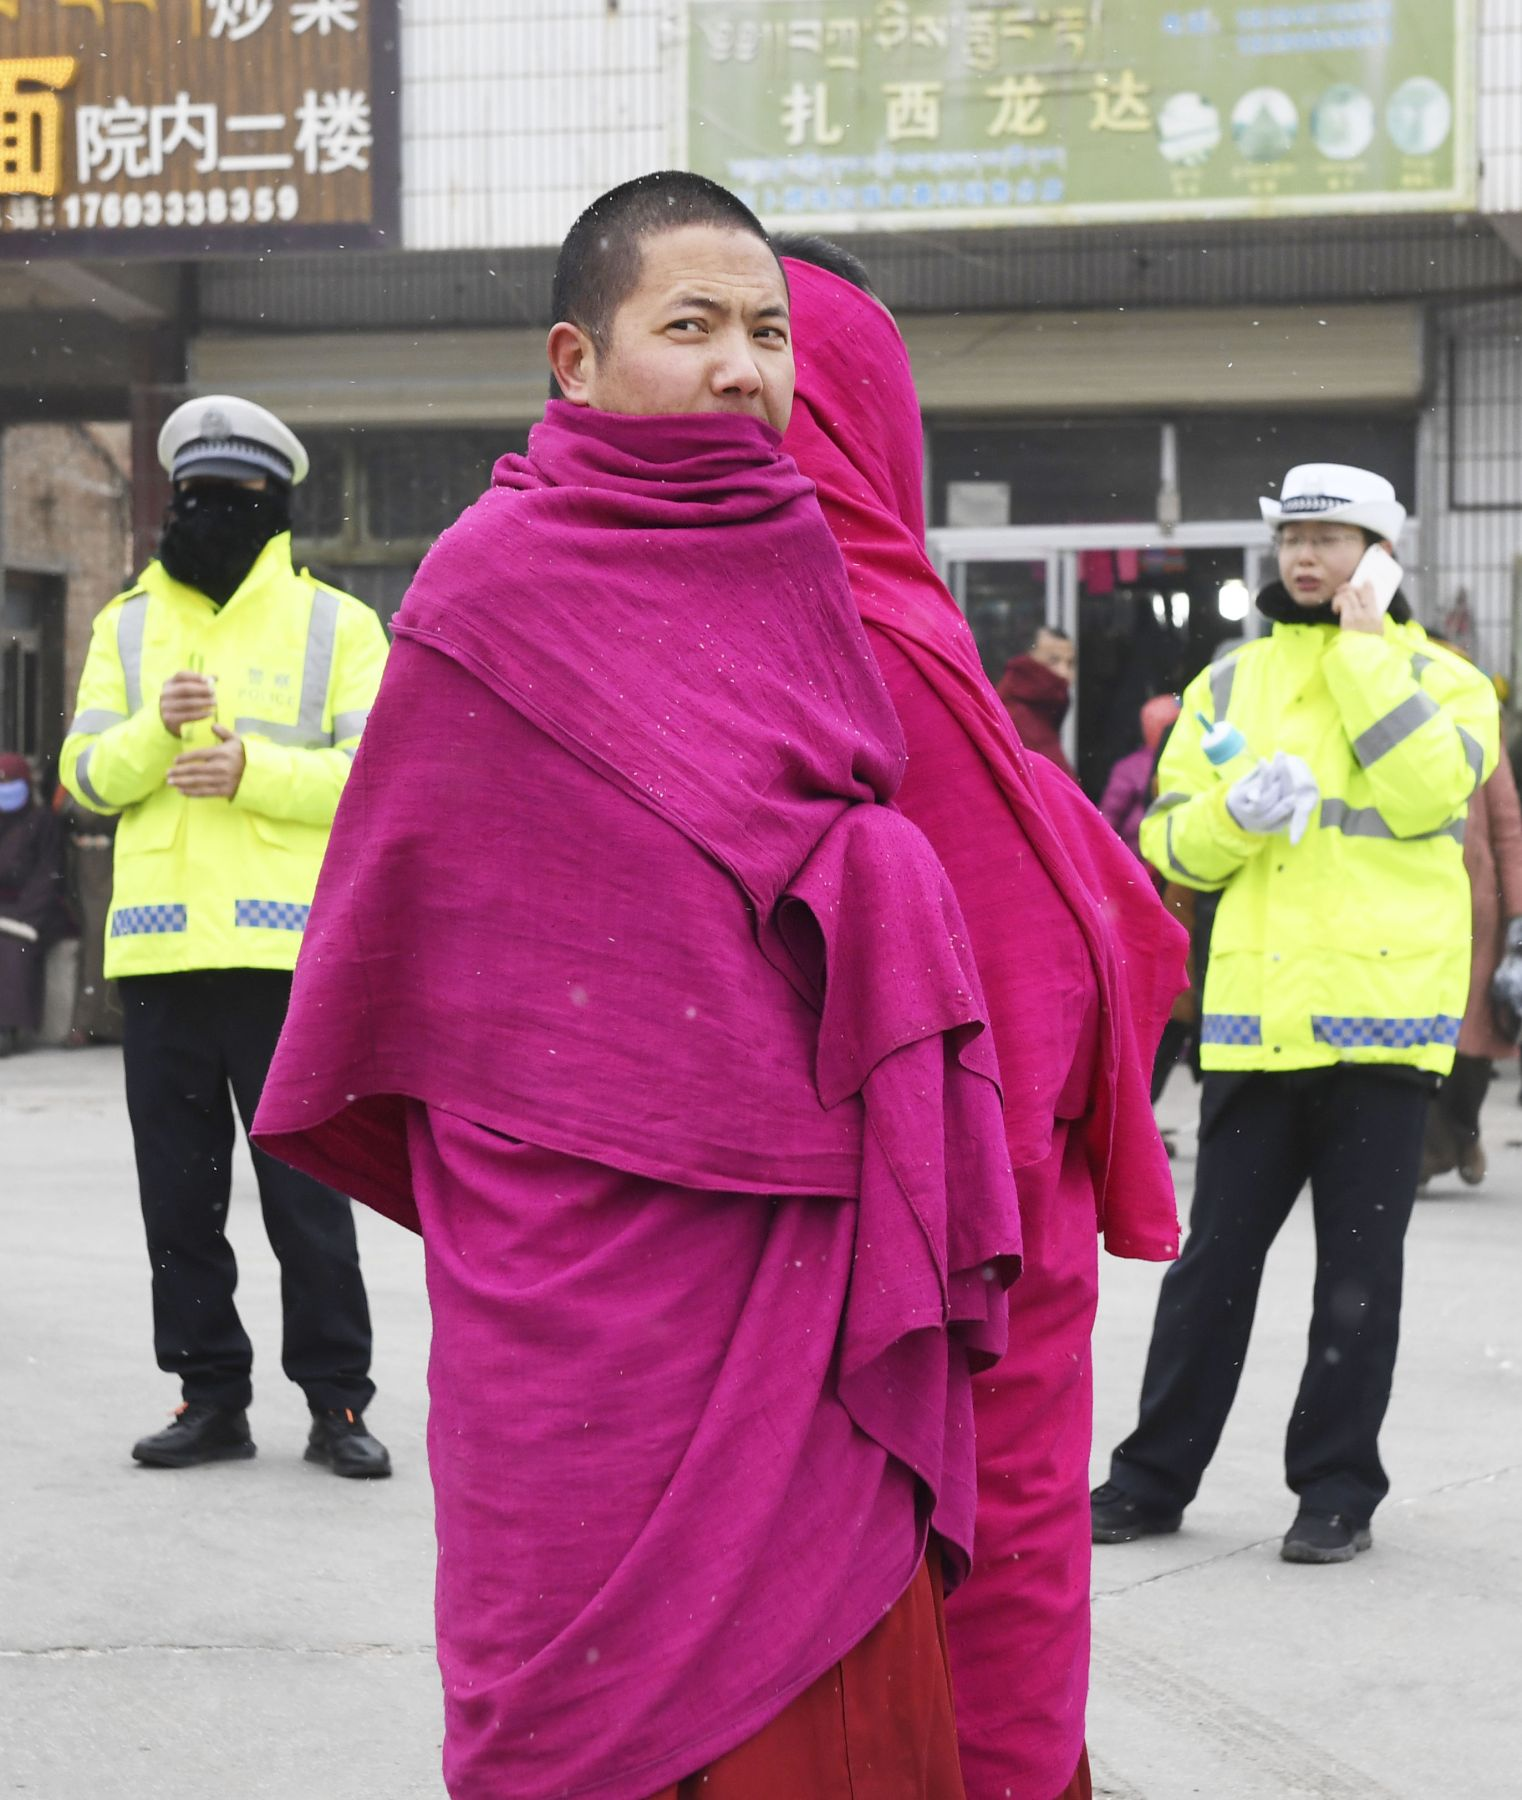 China Tibet and Uighurs Chinese Centrism Suppression of Minorities 014